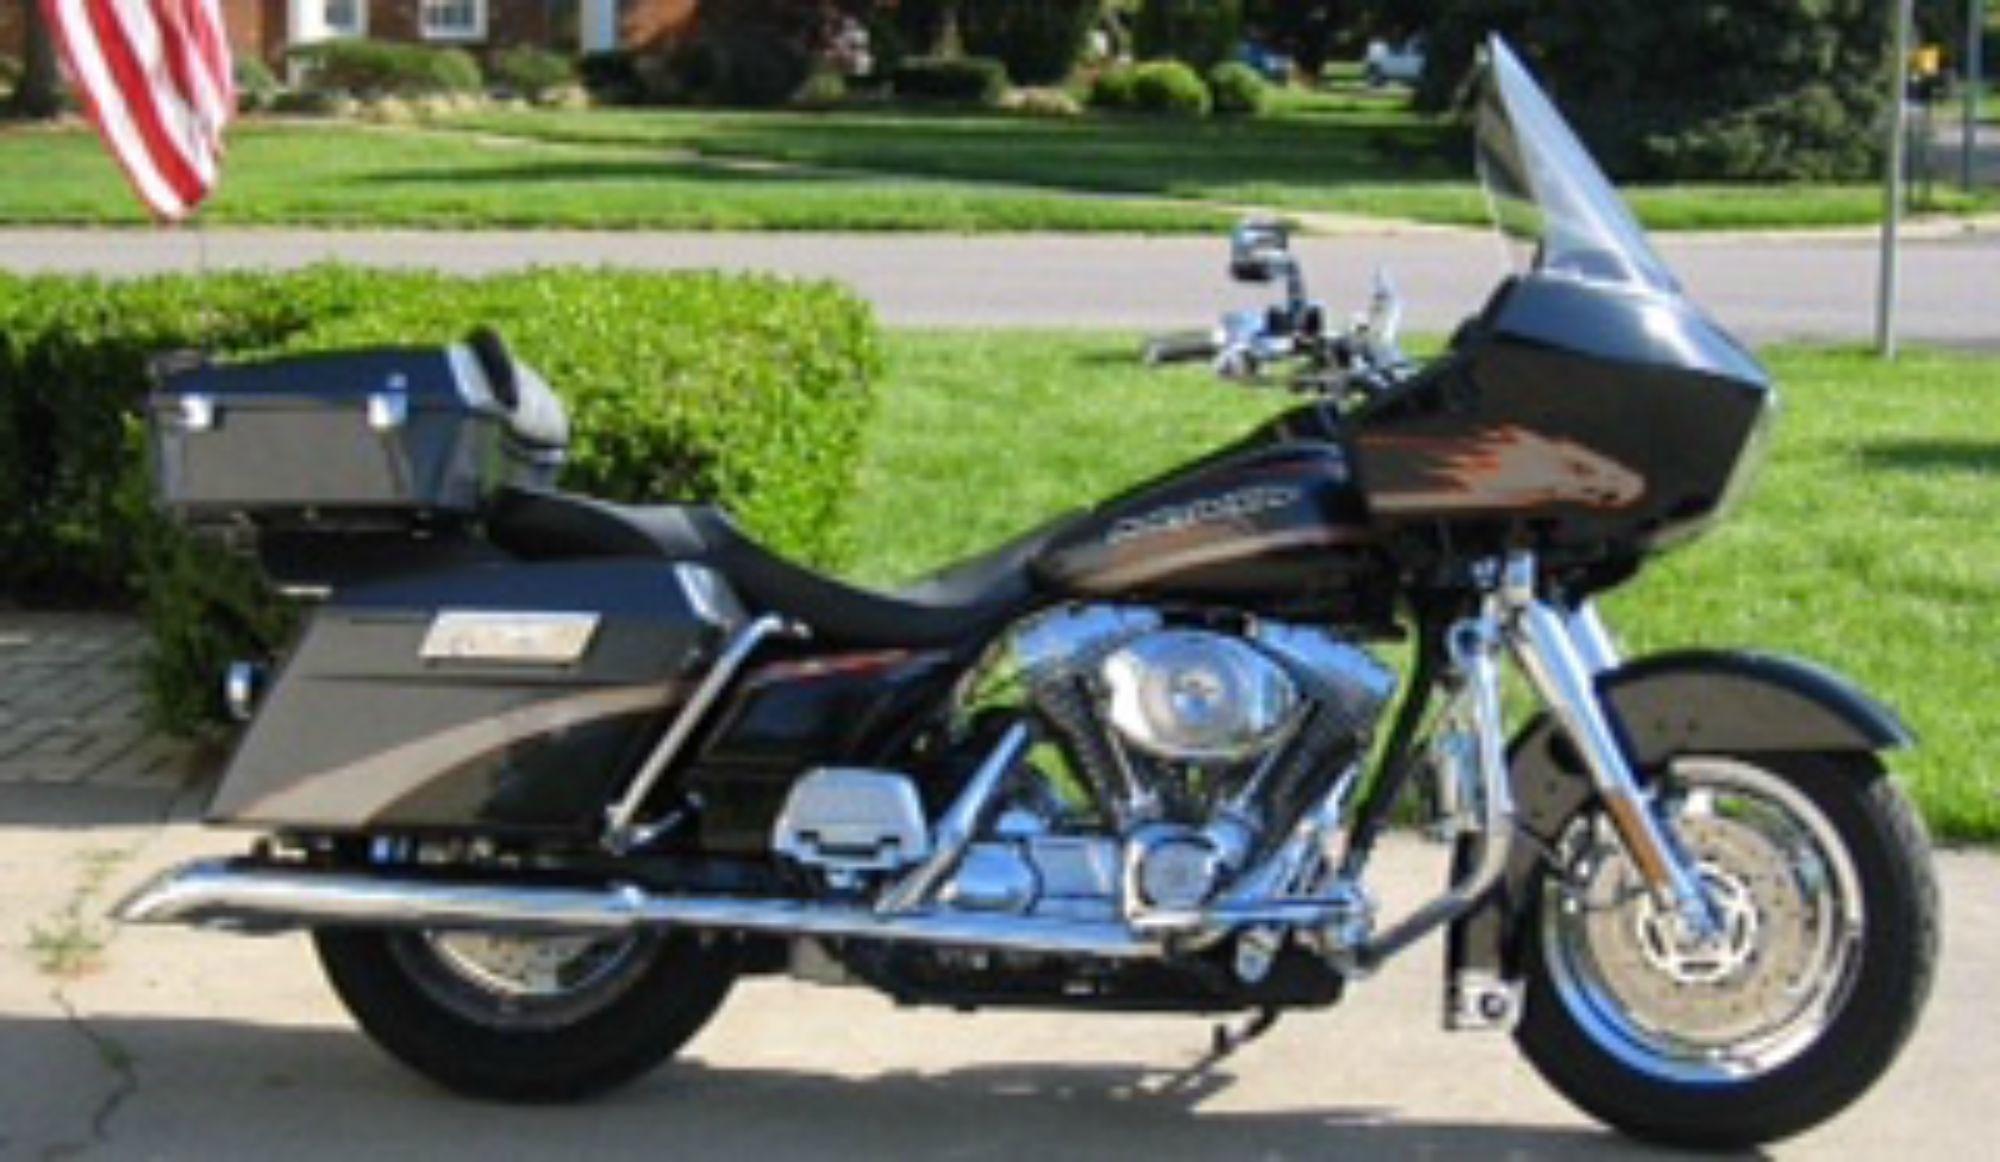 2001 Harley-Davidson® FLTRSEI Screamin' Eagle® Road Glide® (Vivid Black /  Platinum Silver & Charcoal), Jeffersonville, Indiana (541755) |  ChopperExchange